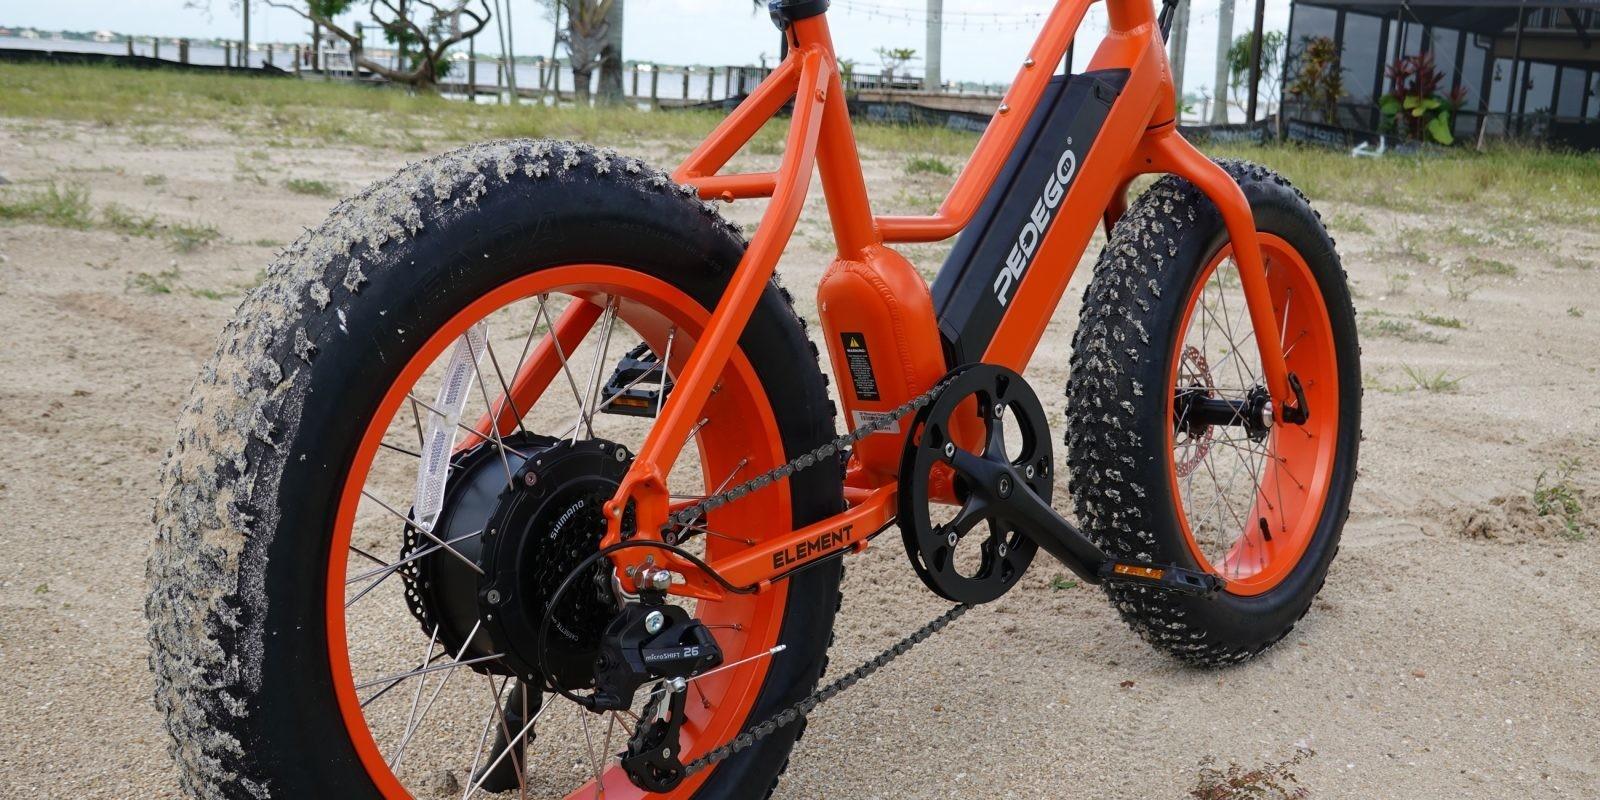 Pedego Element electric bike review: Pedego's cheapest e-bike still rocks!